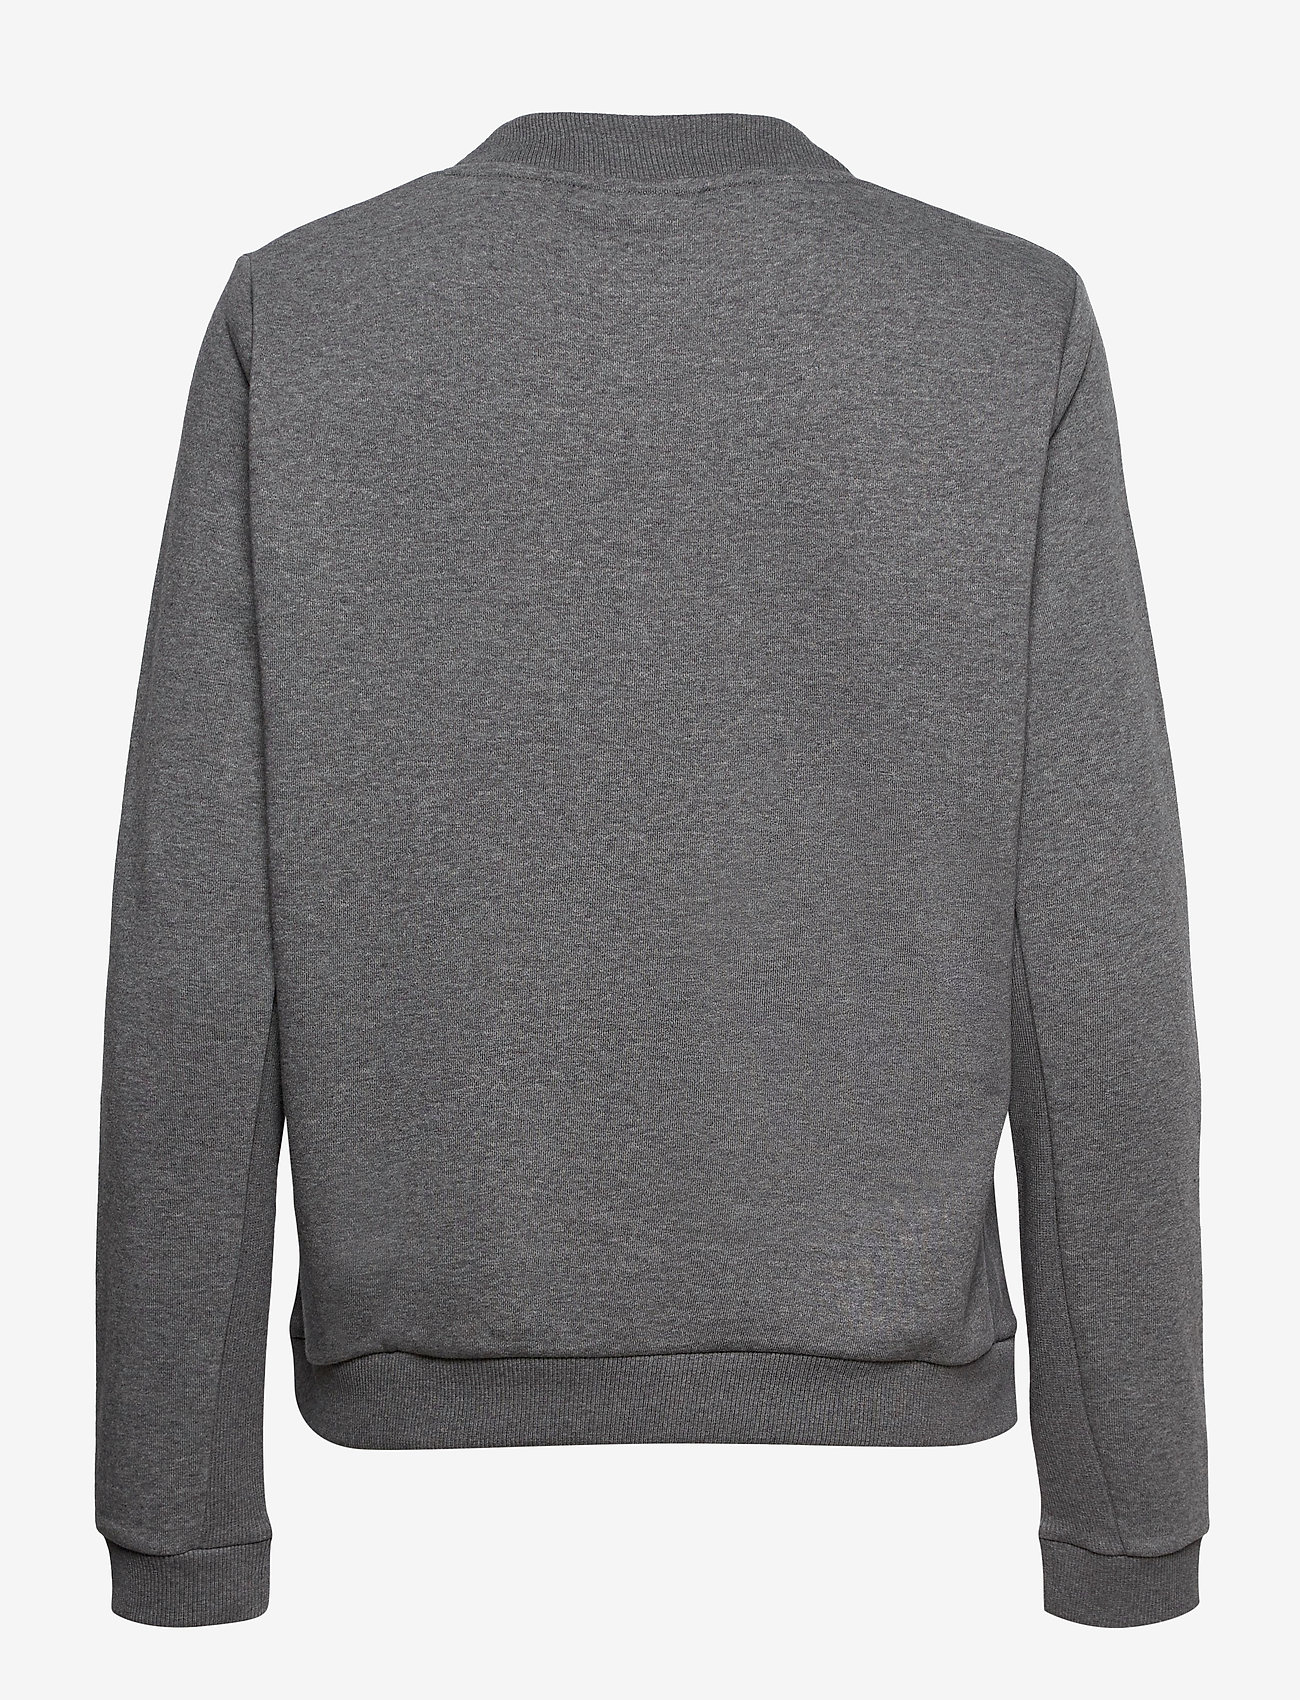 Lacoste - Women s sweatshirt - sweatshirts - pitch chine - 1